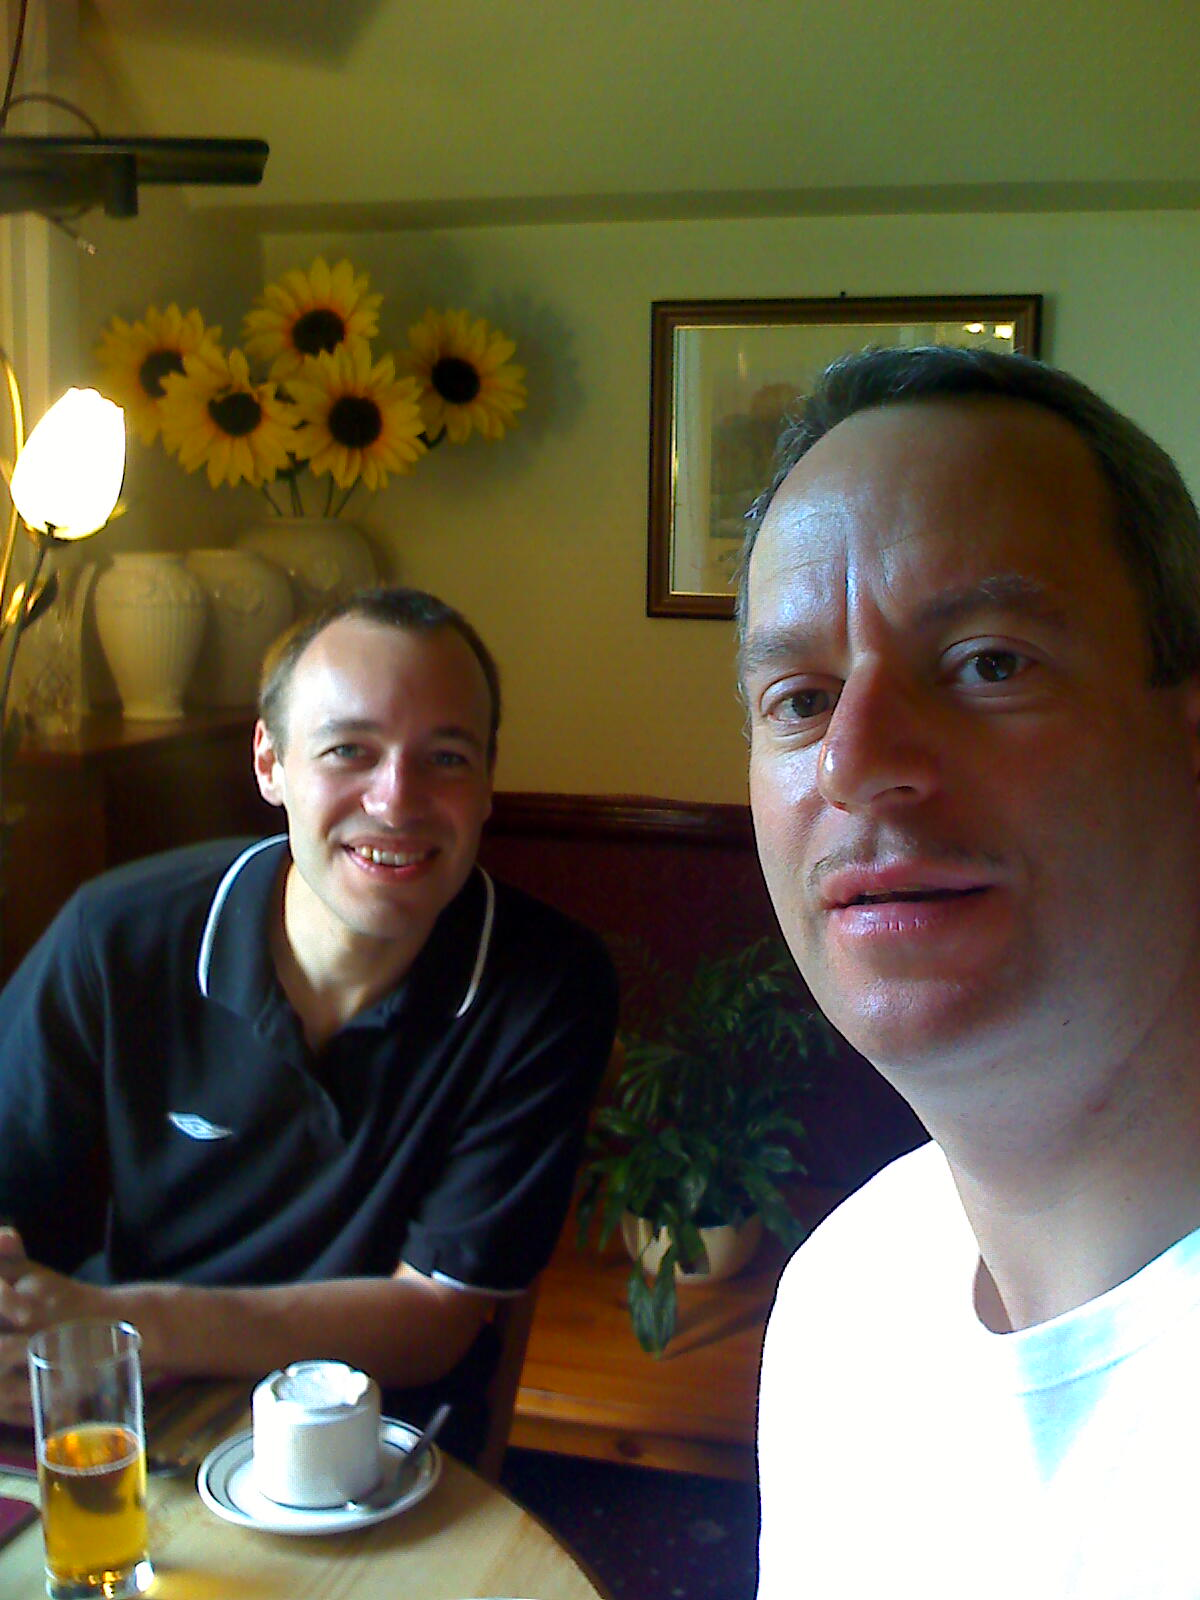 Breakfast time in Carlisle /images/flyuk-2009/moto_0197.jpg